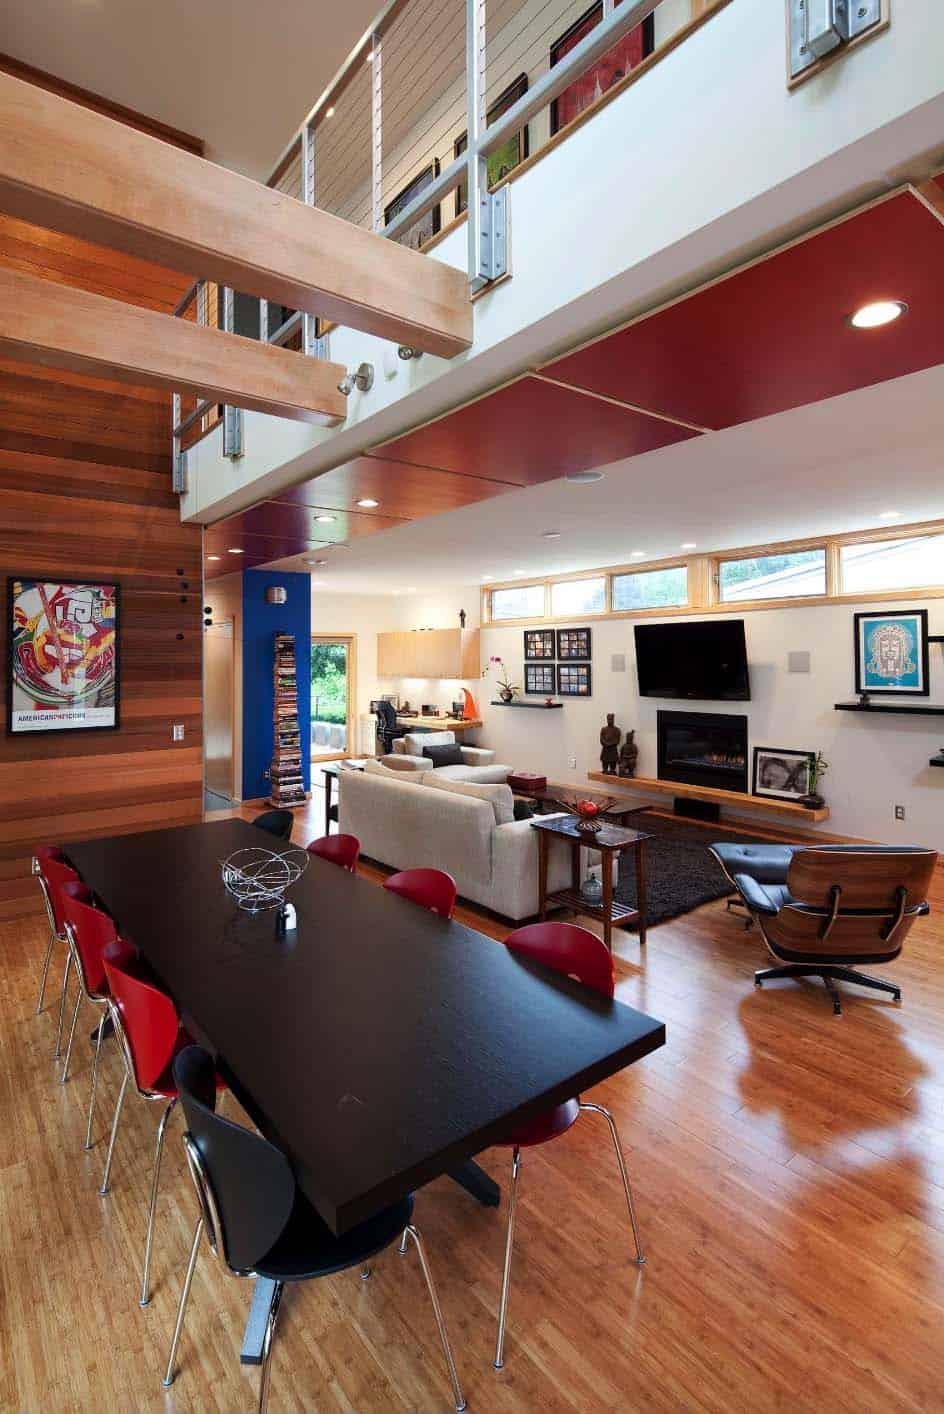 Modern Sustainable Home-LEED-SALA Architects-09-1 Kindesign